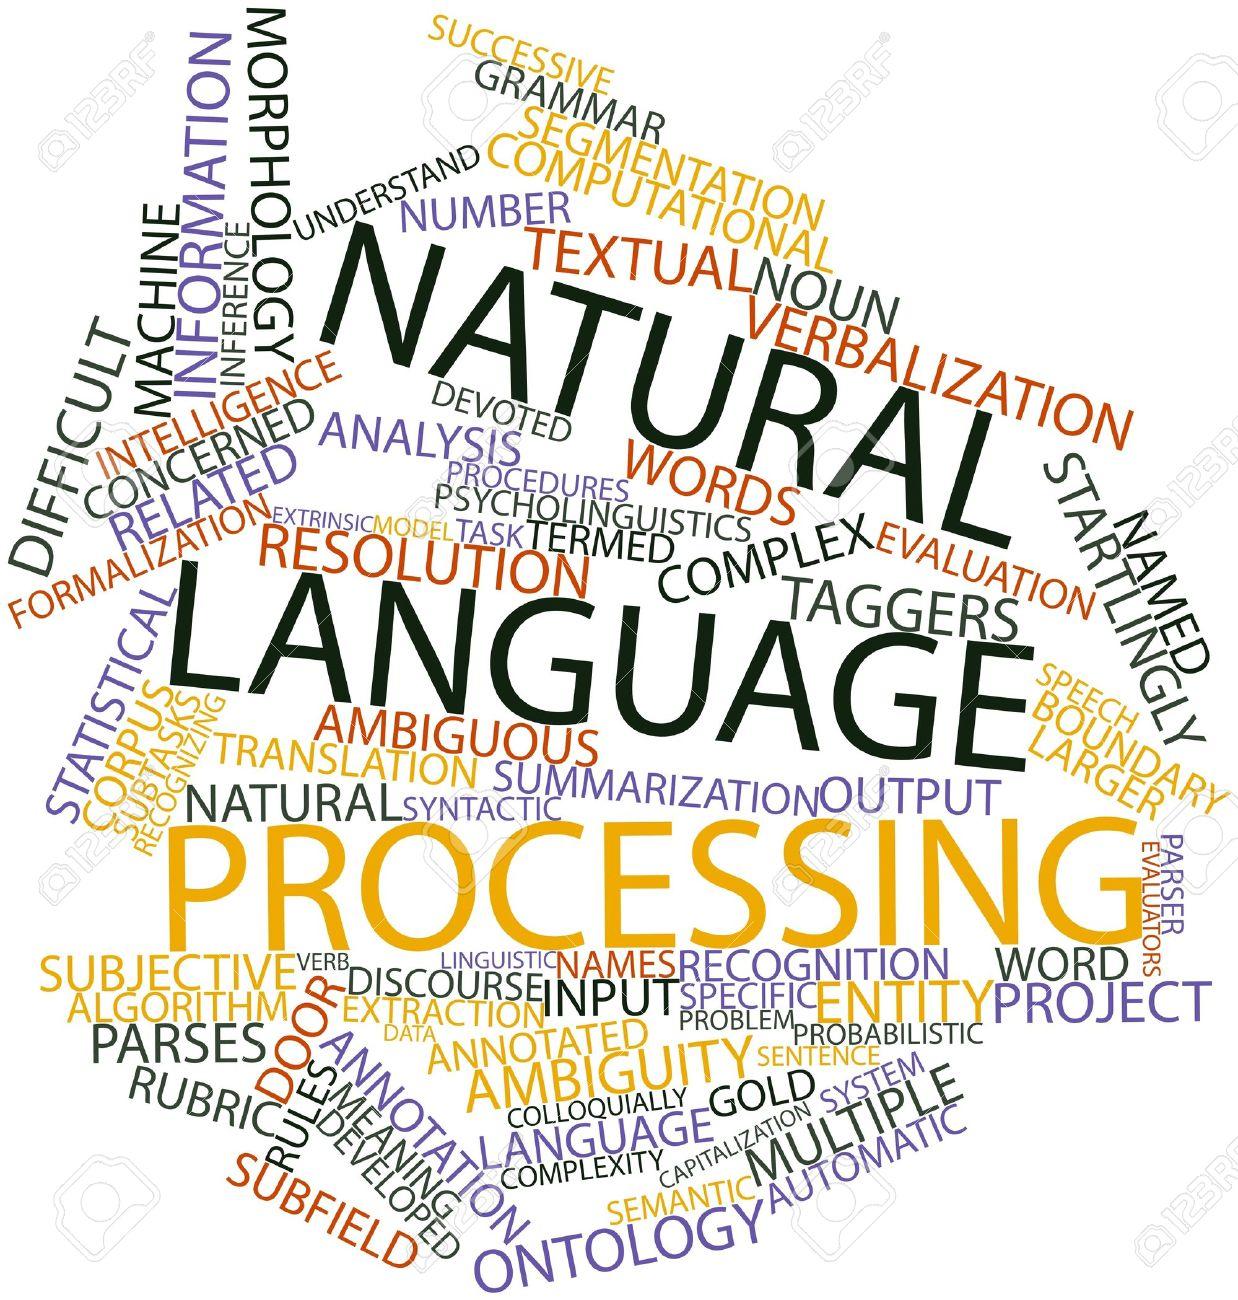 Natural Language Processing (NLP) & Text Analytics - Обработка языка (NLP) и анализ текста